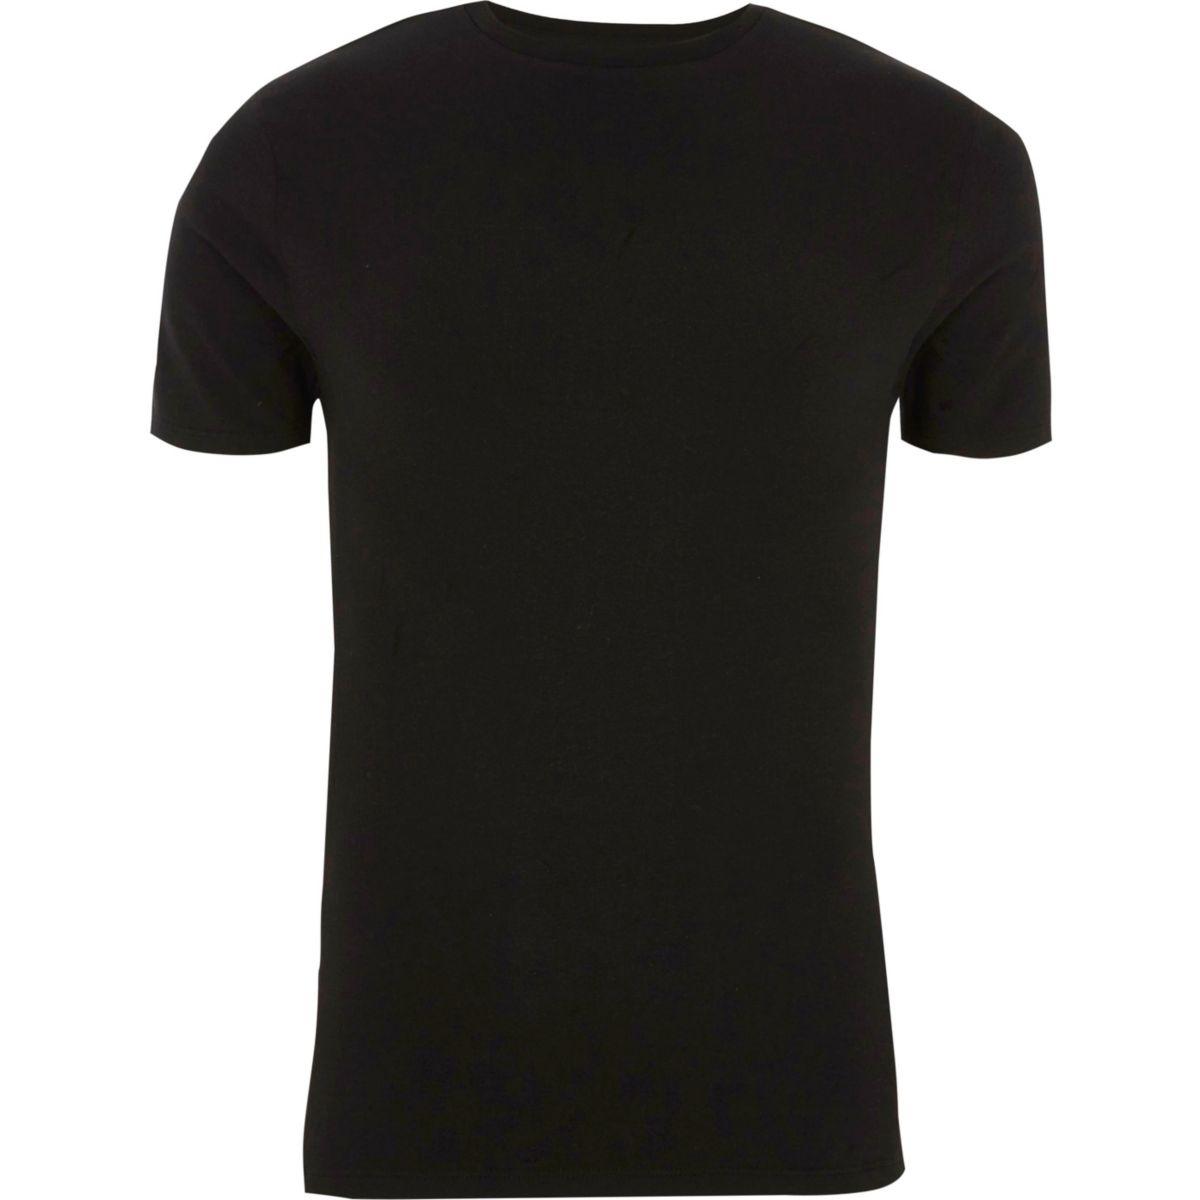 Black rib panel muscle fit T-shirt